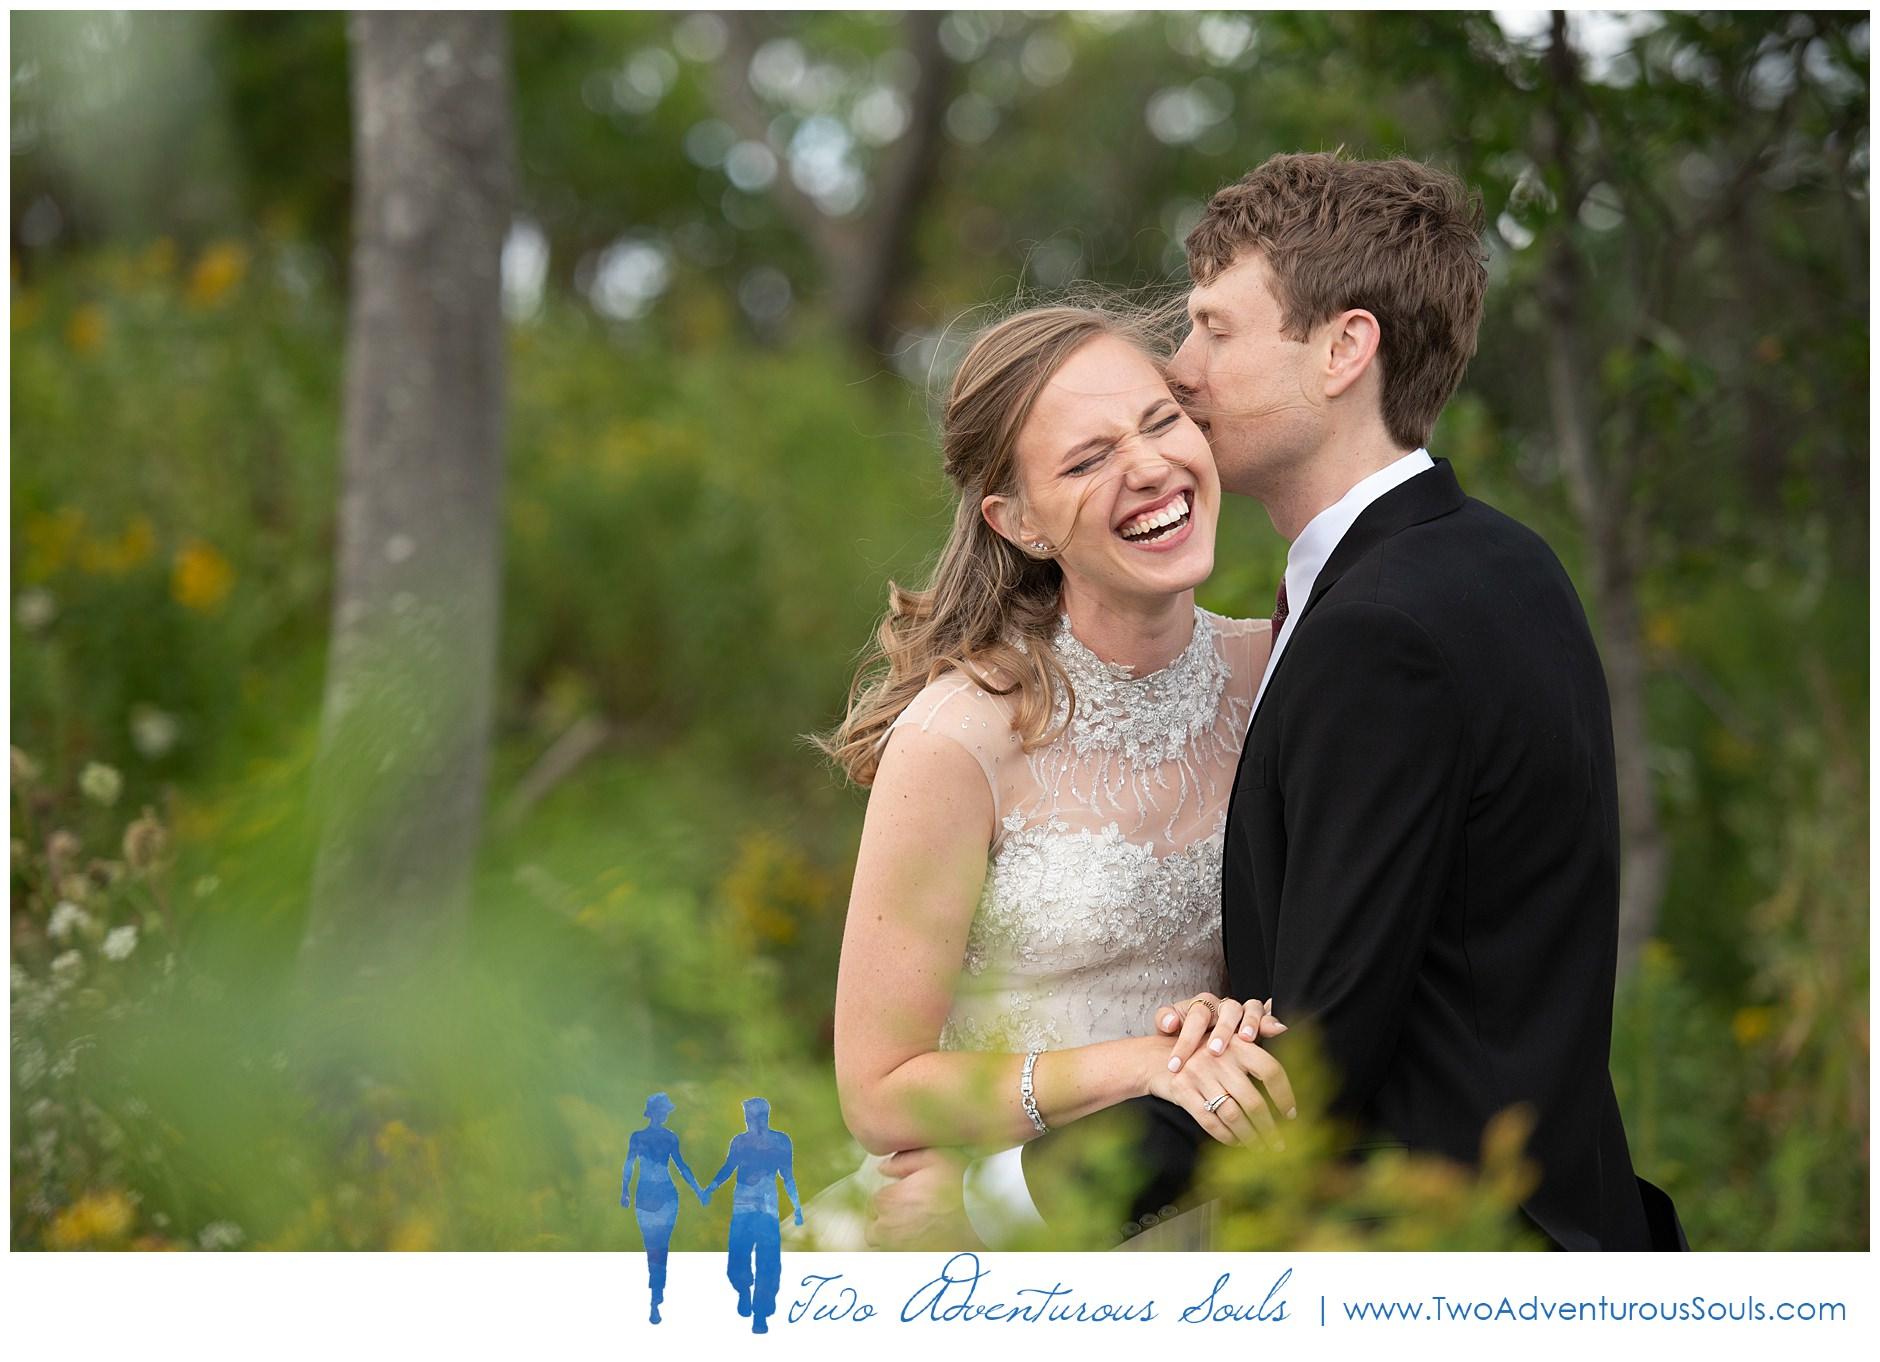 Grace Maine Photographers, Portland Maine Wedding Photographers, Two Adventurous Souls- 090719_0014.jpg